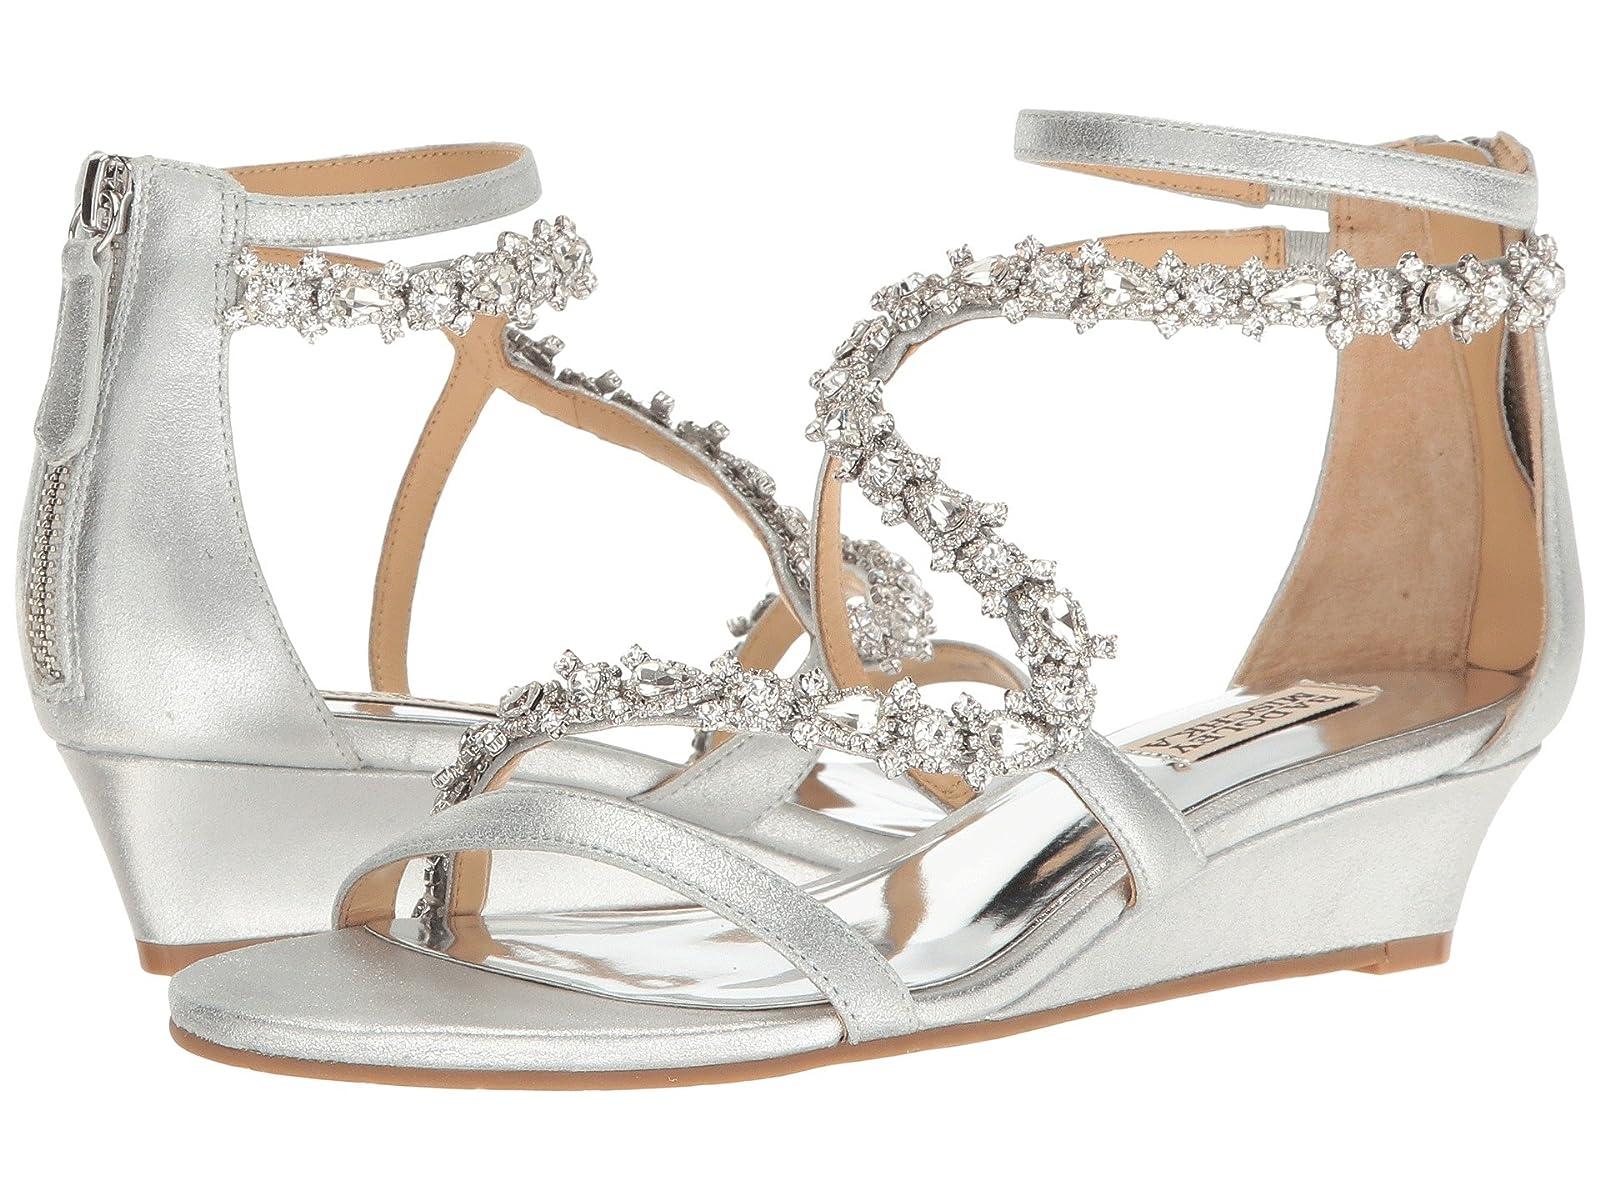 Badgley Mischka BelvedereCheap and distinctive eye-catching shoes